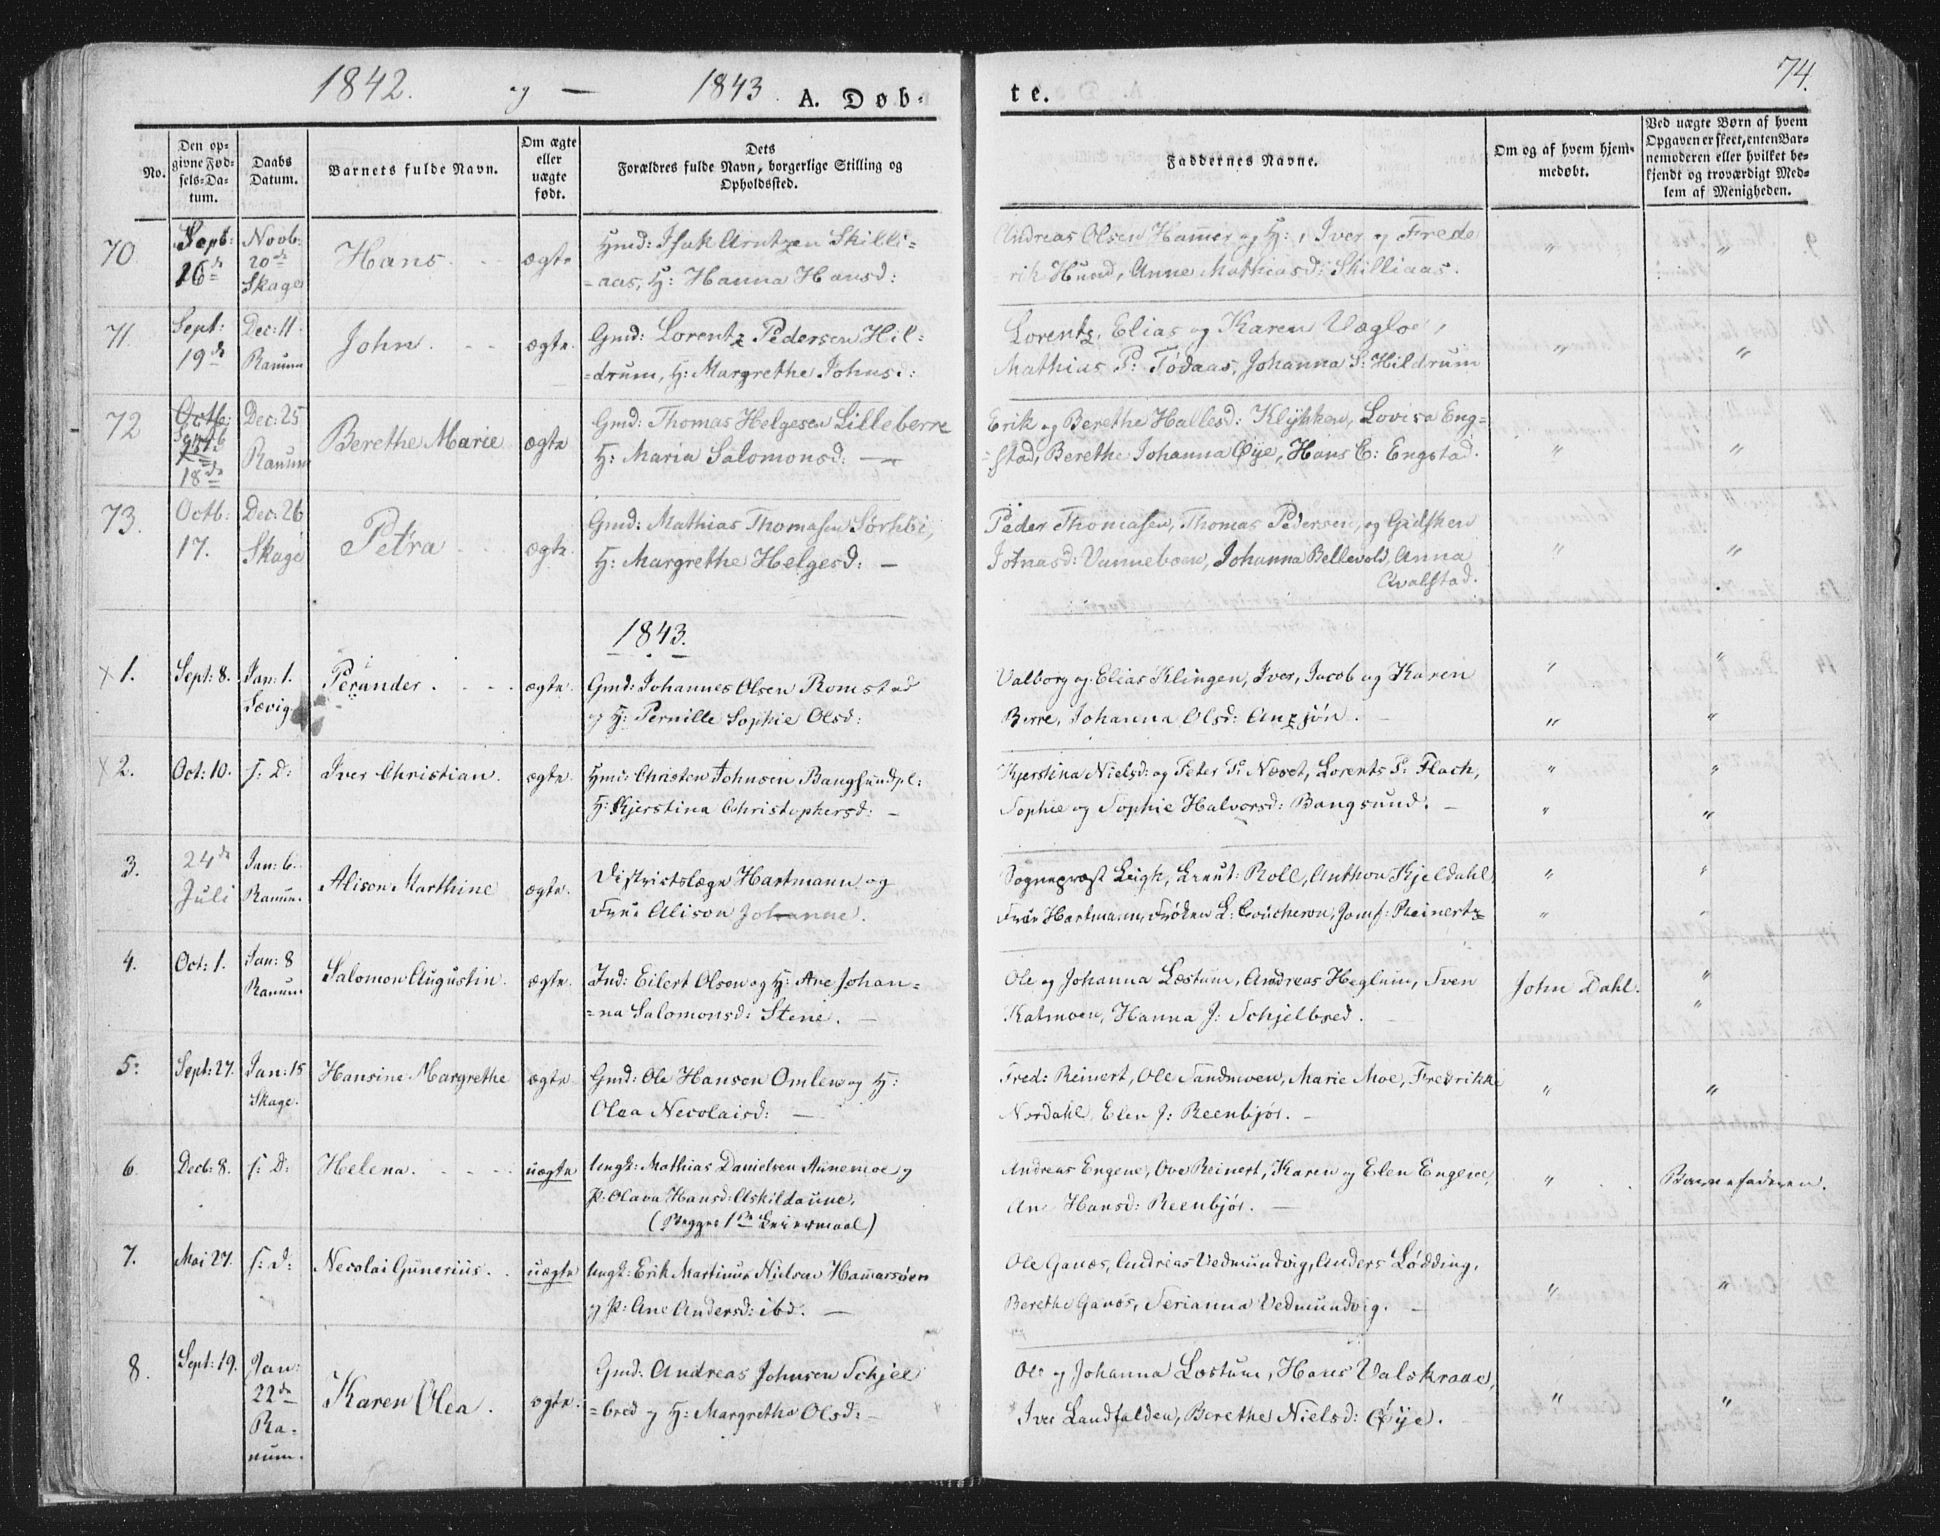 SAT, Ministerialprotokoller, klokkerbøker og fødselsregistre - Nord-Trøndelag, 764/L0551: Ministerialbok nr. 764A07a, 1824-1864, s. 74